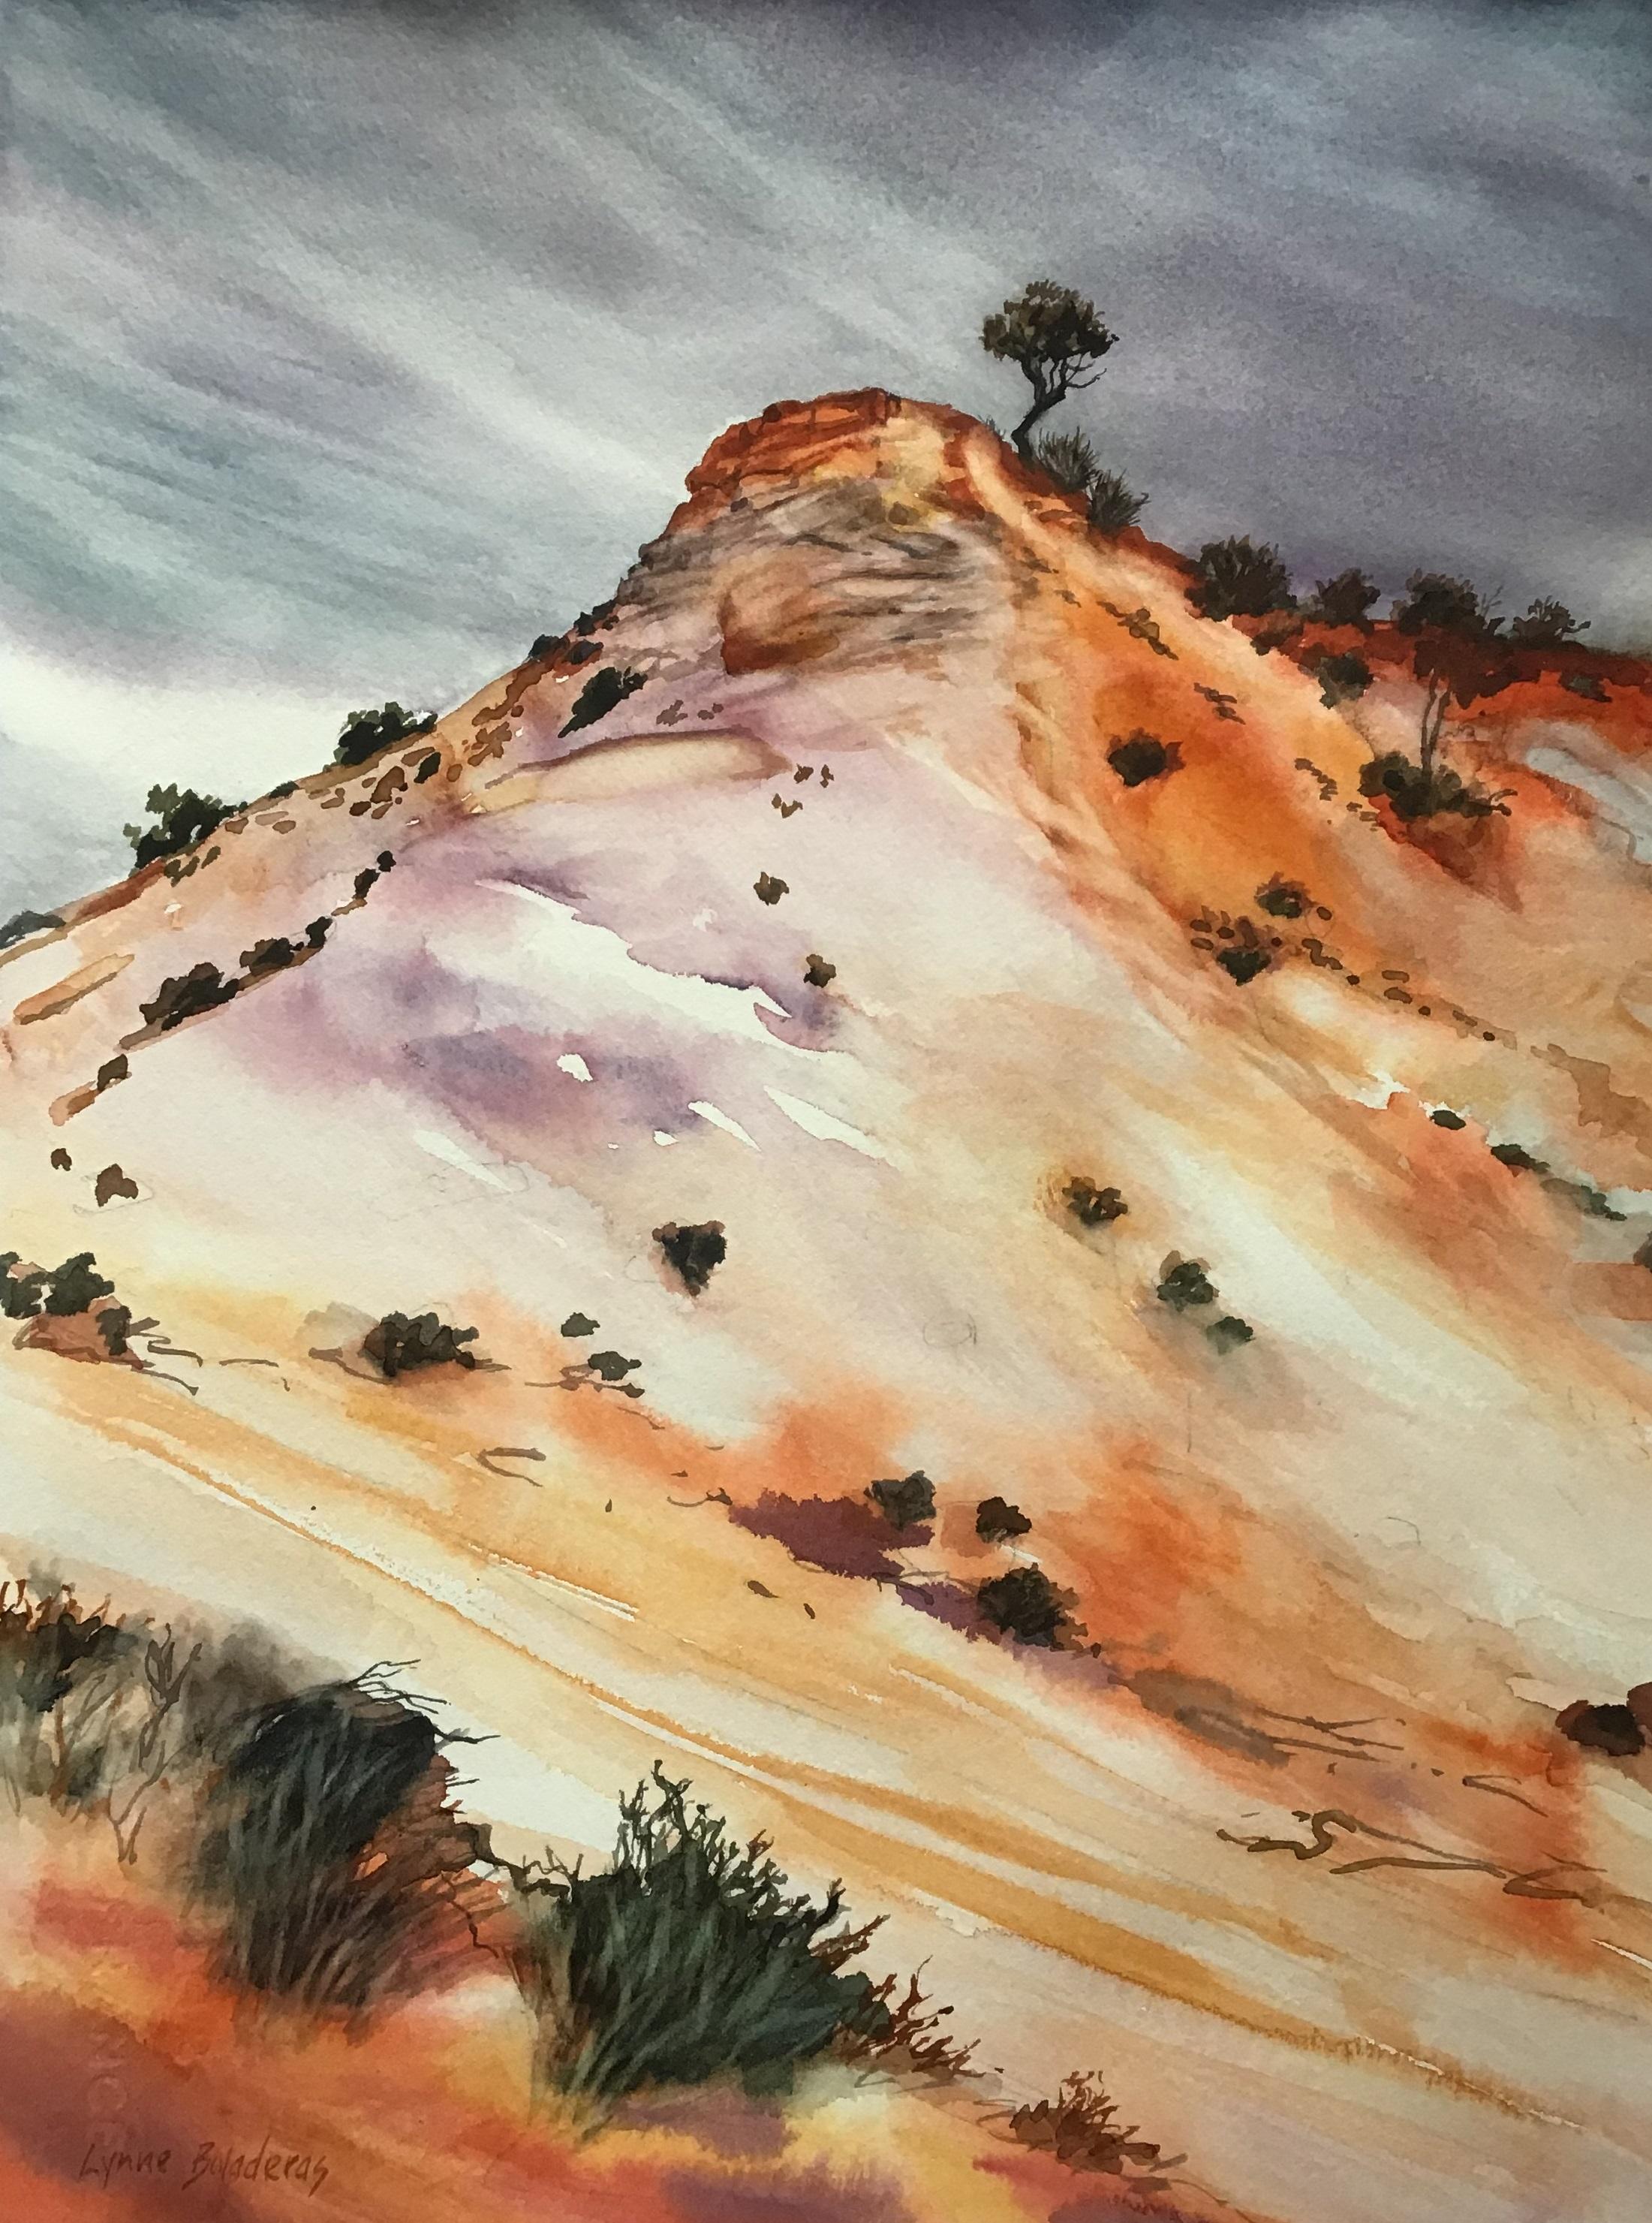 Lynne Boladeras_Neale Breakaway 3_Watercolour_28 x 38cm_$550.JPG